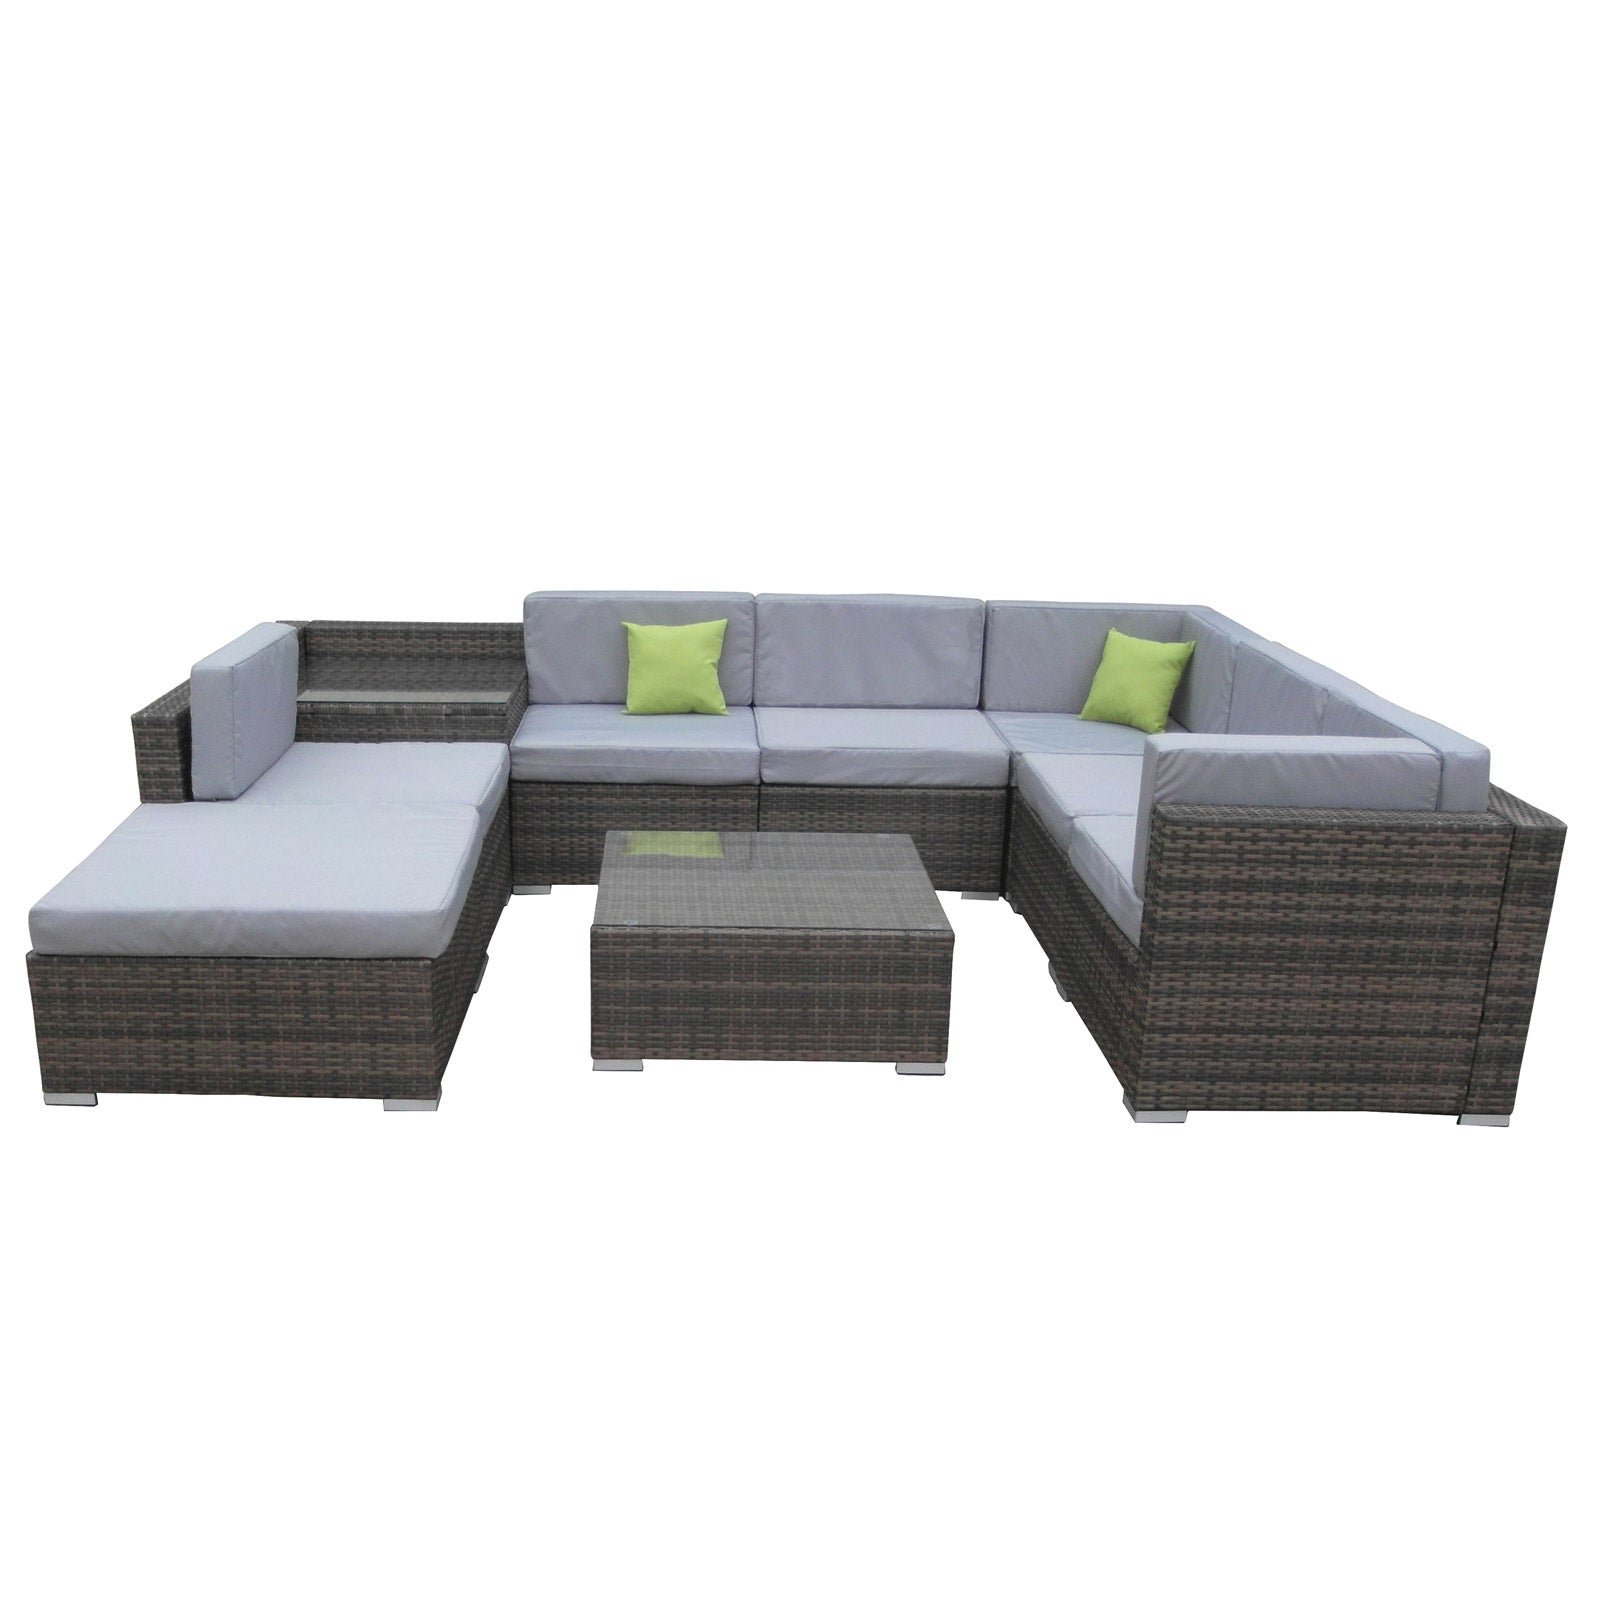 Milano 9 Piece Wicker Rattan Sofa Set Oatmeal Grey Outdoor Lounge Furniture Oatmeal